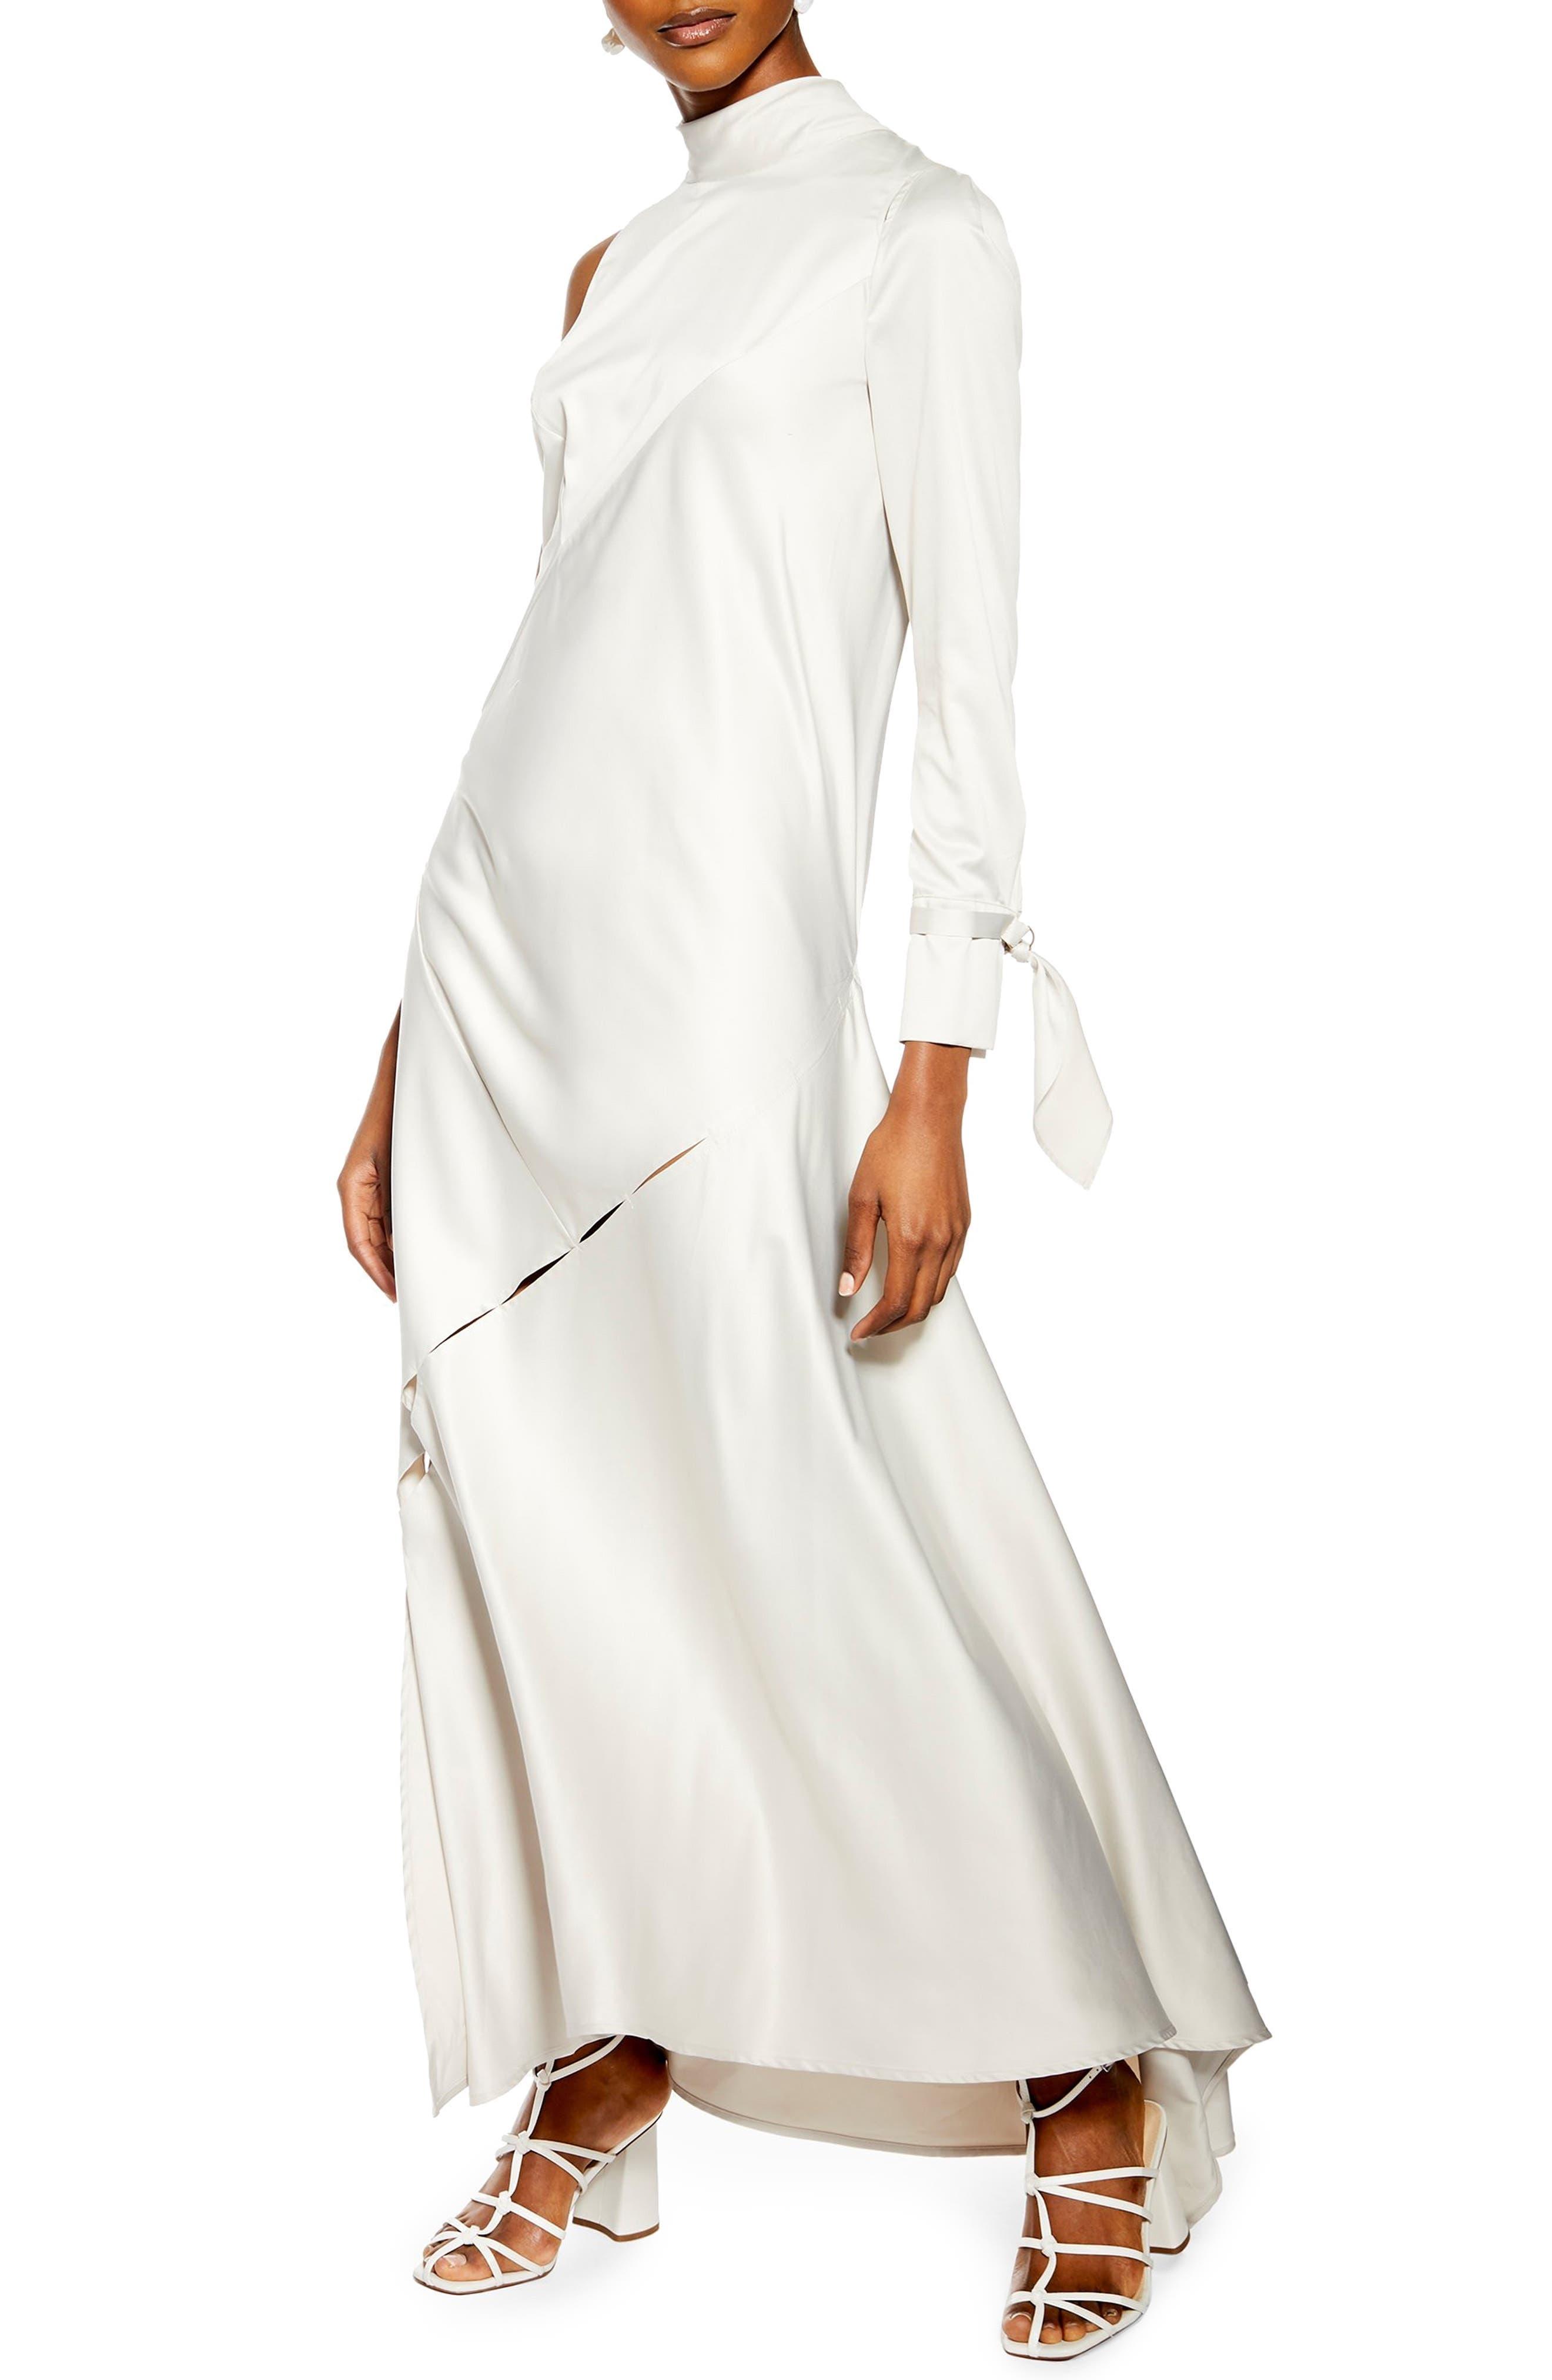 Topshop One-Sleeve Maxi Dress, US (fits like 6-8) - Grey